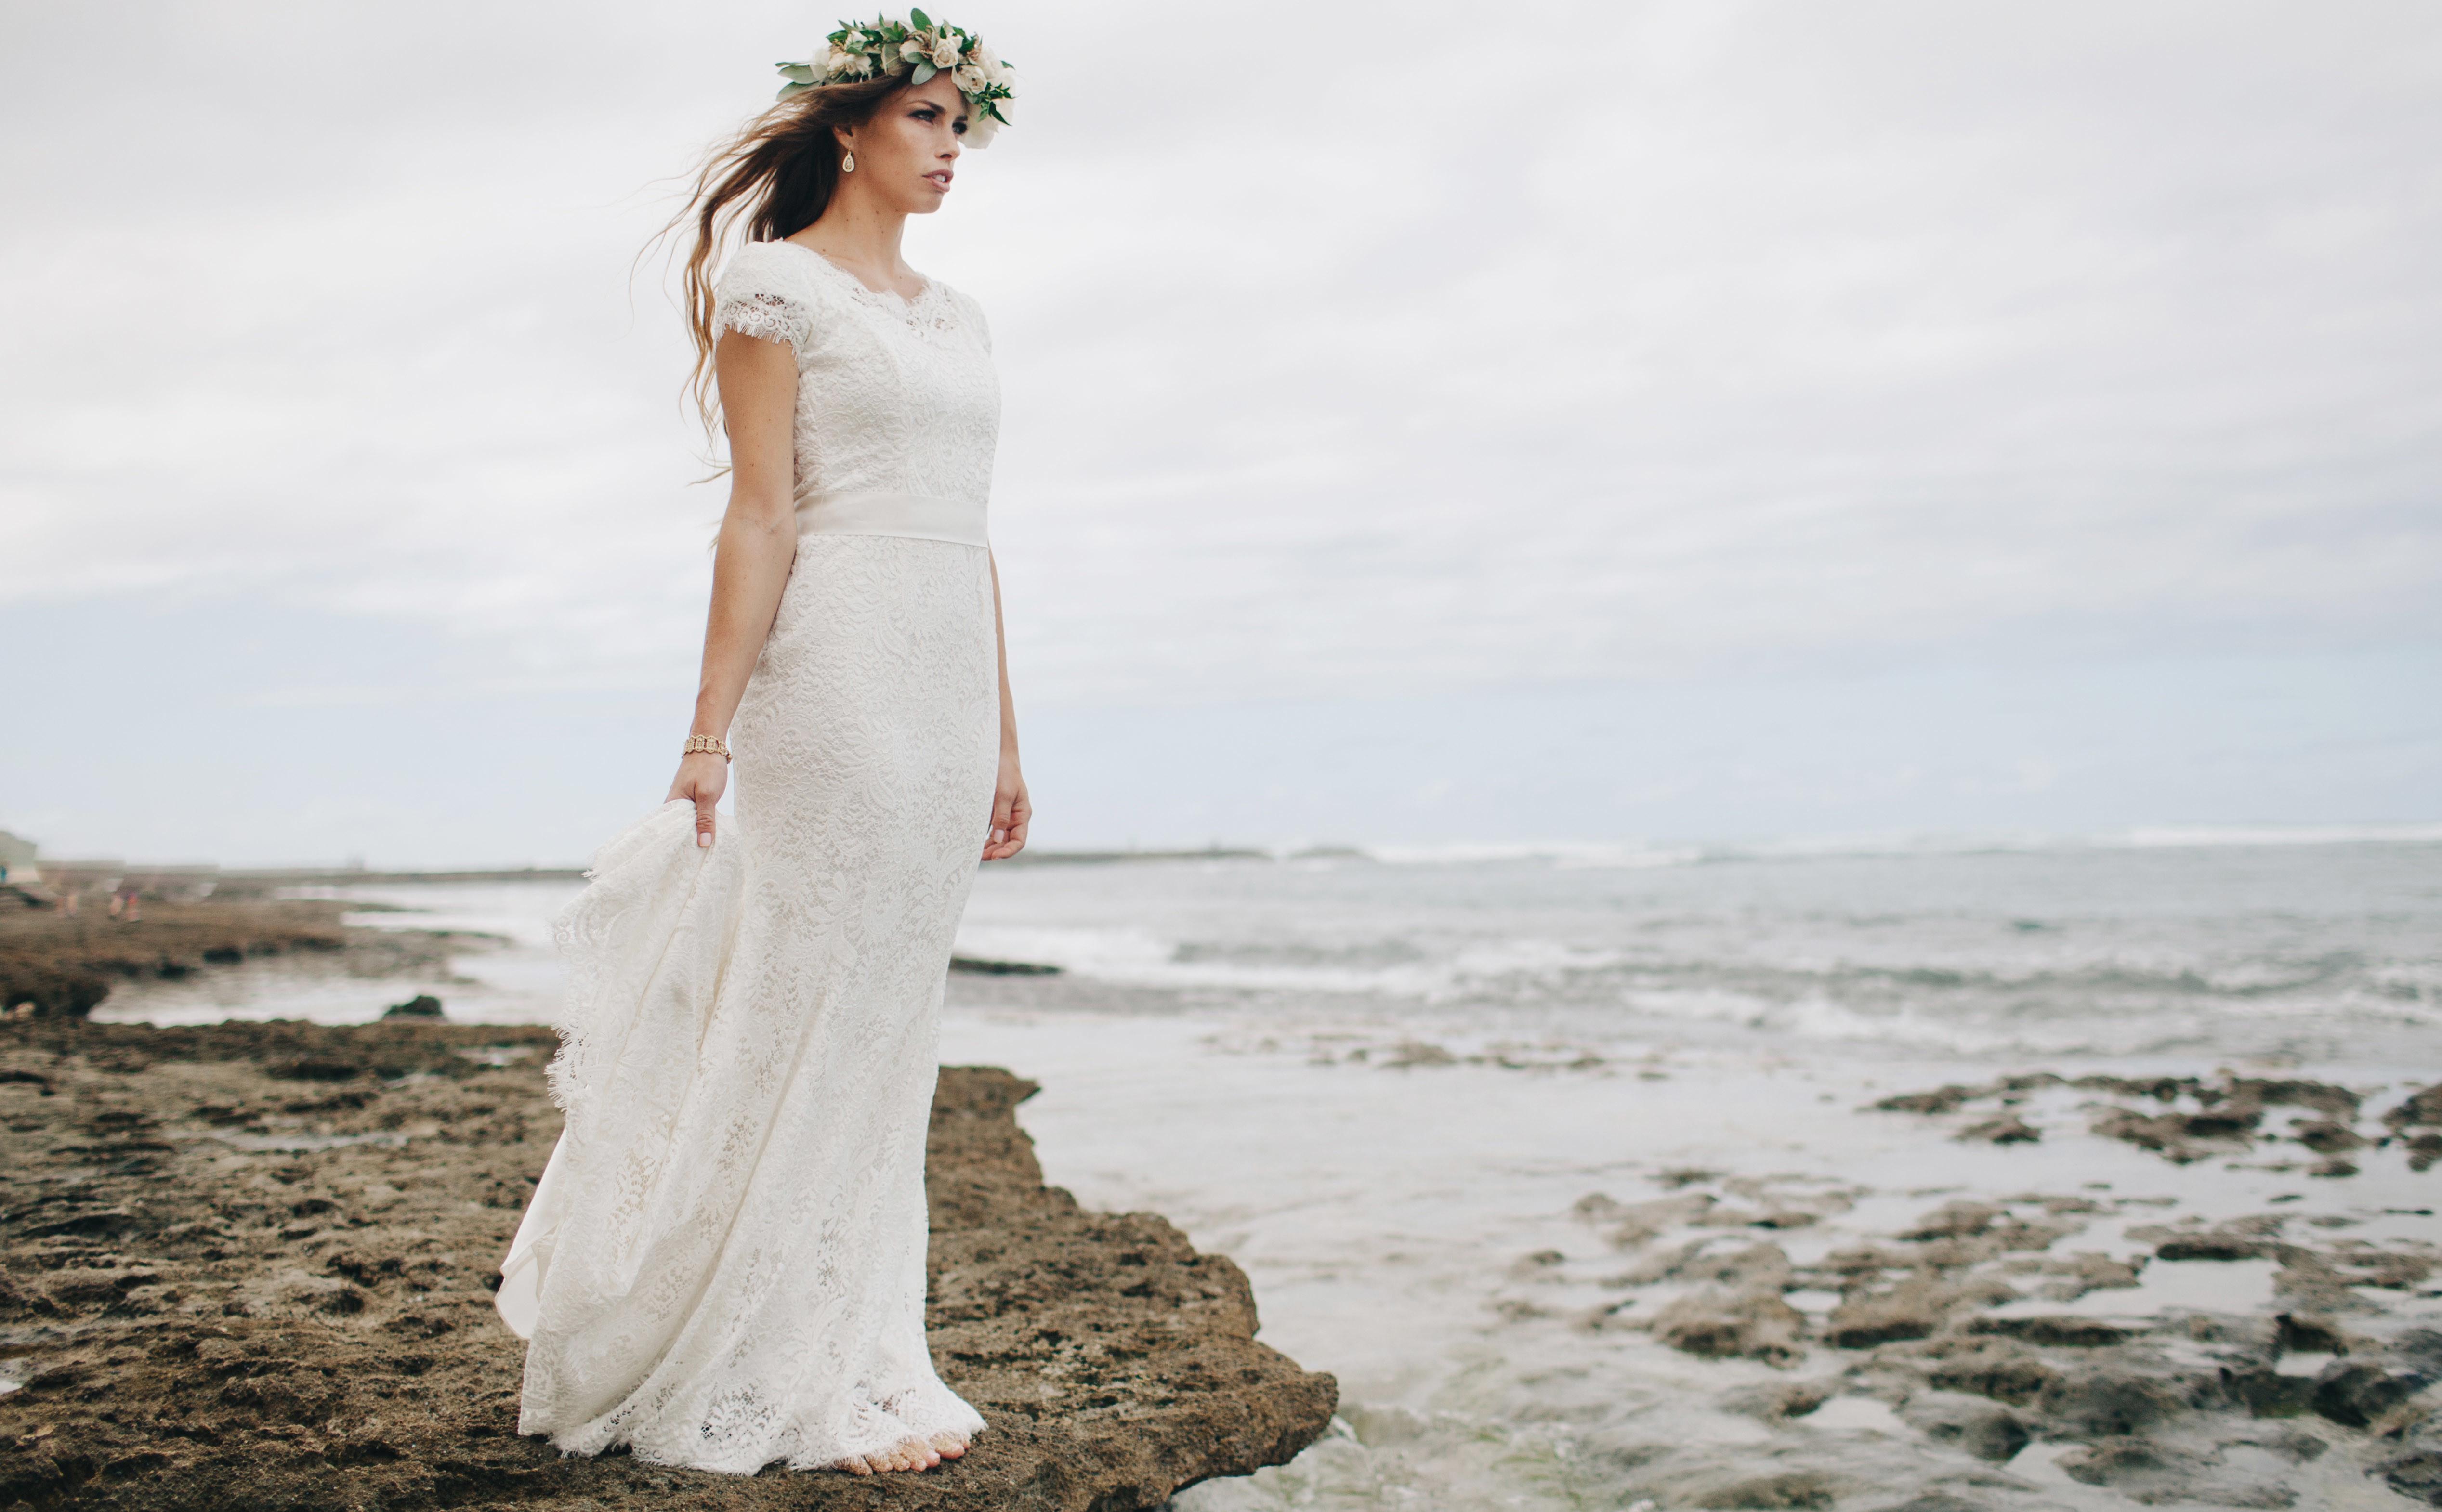 wedding dresses provo utah | Wedding